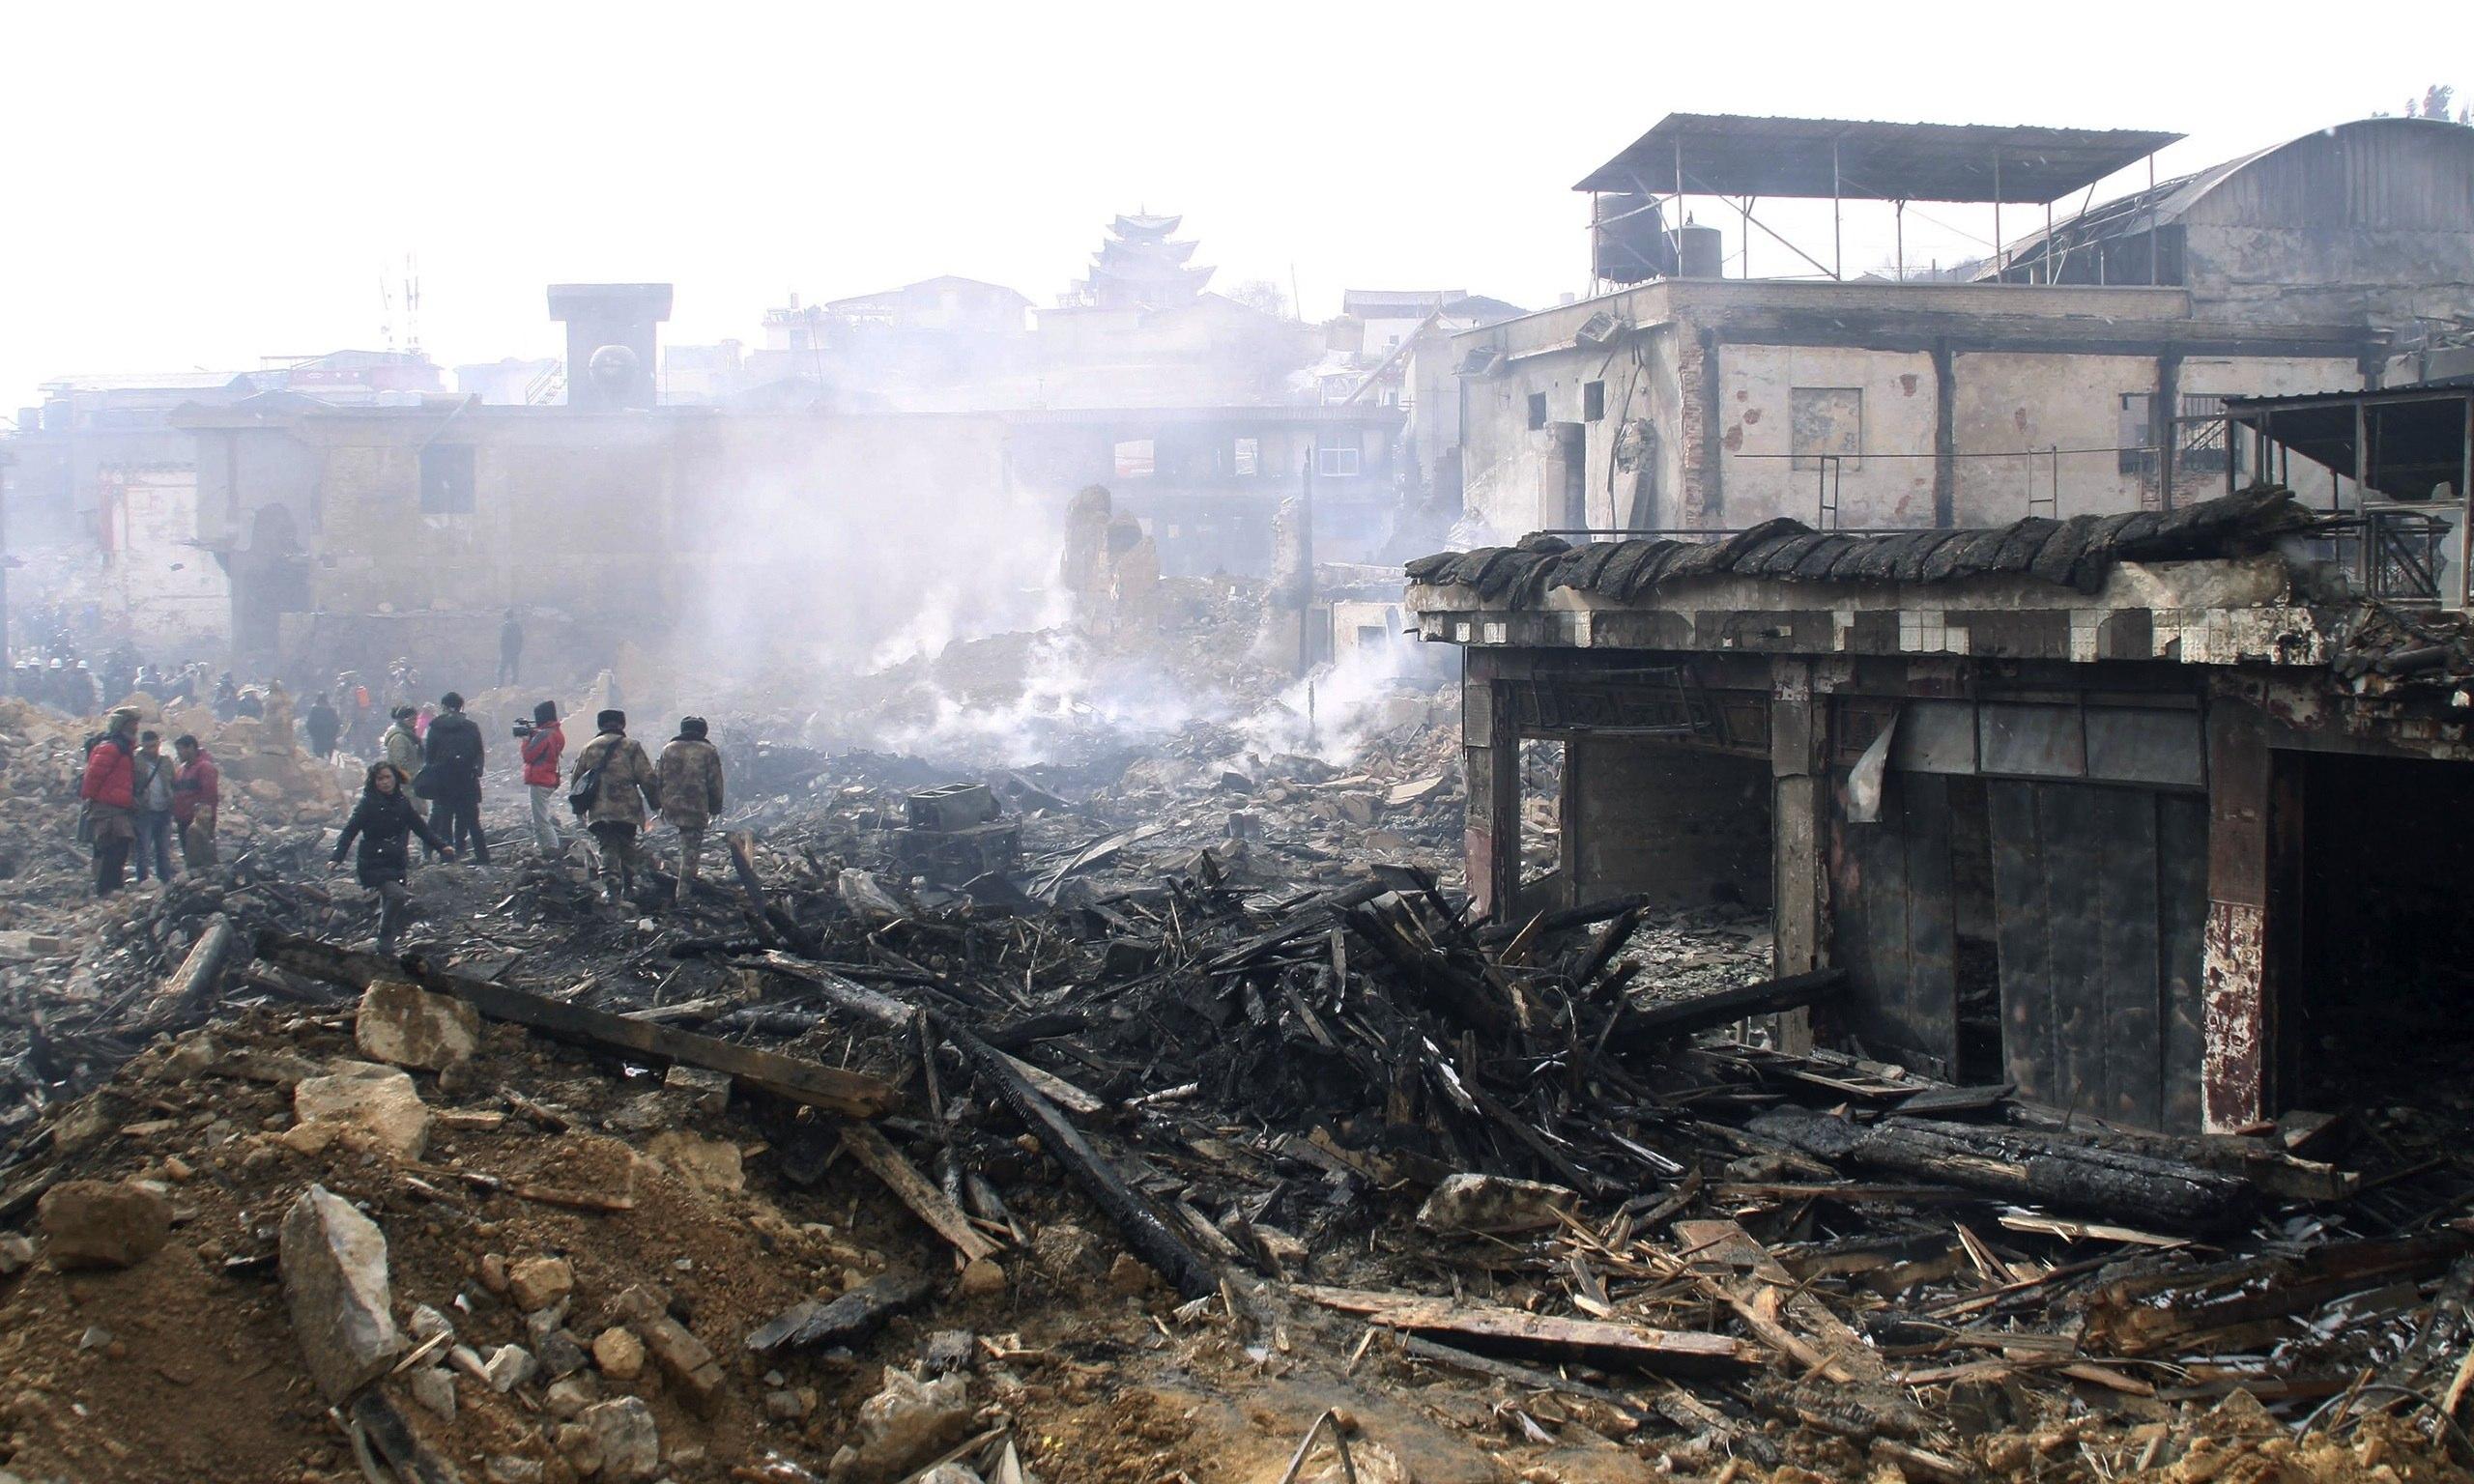 Shangri-La fire defence was shut off while Tibetan town burned